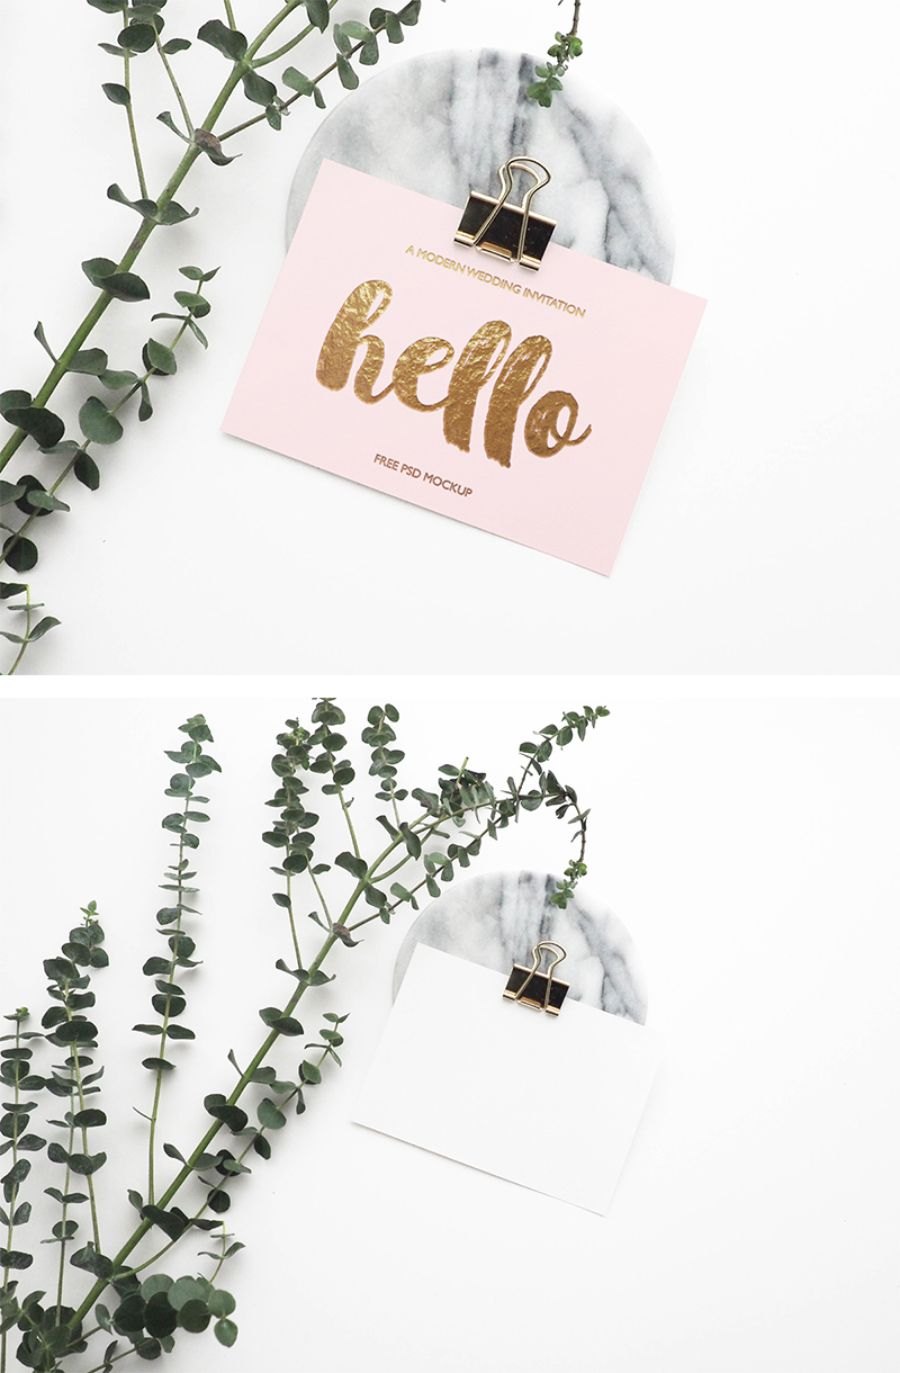 Stylish Greeting Card Free Mockup Mockup And Business Cards